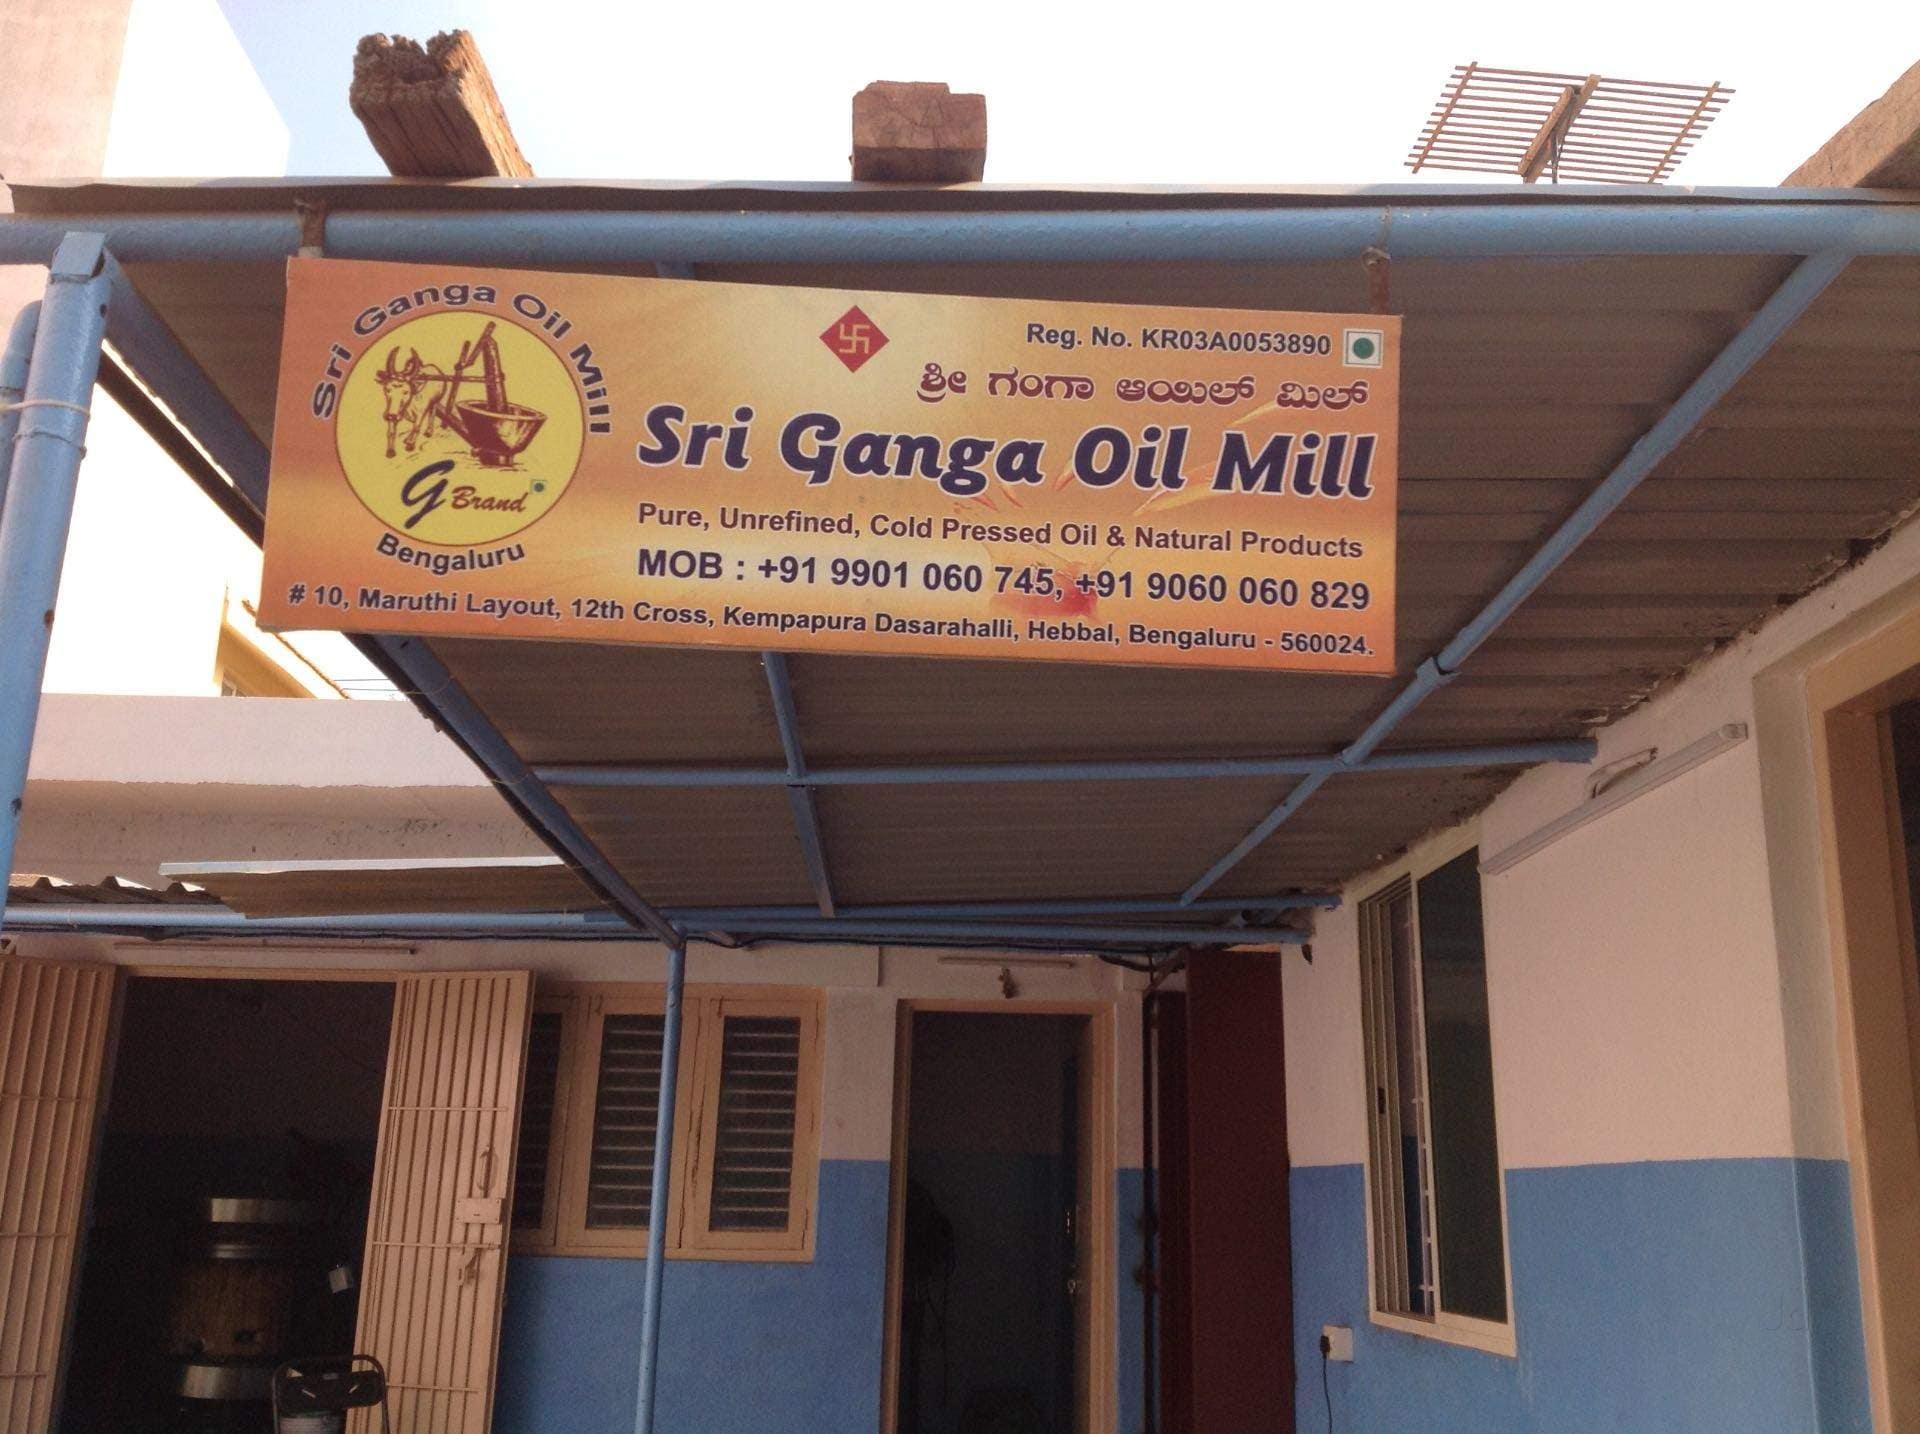 Top 100 Coconut Oil Retailers in Bangalore - Best Virgin Coconut Oil